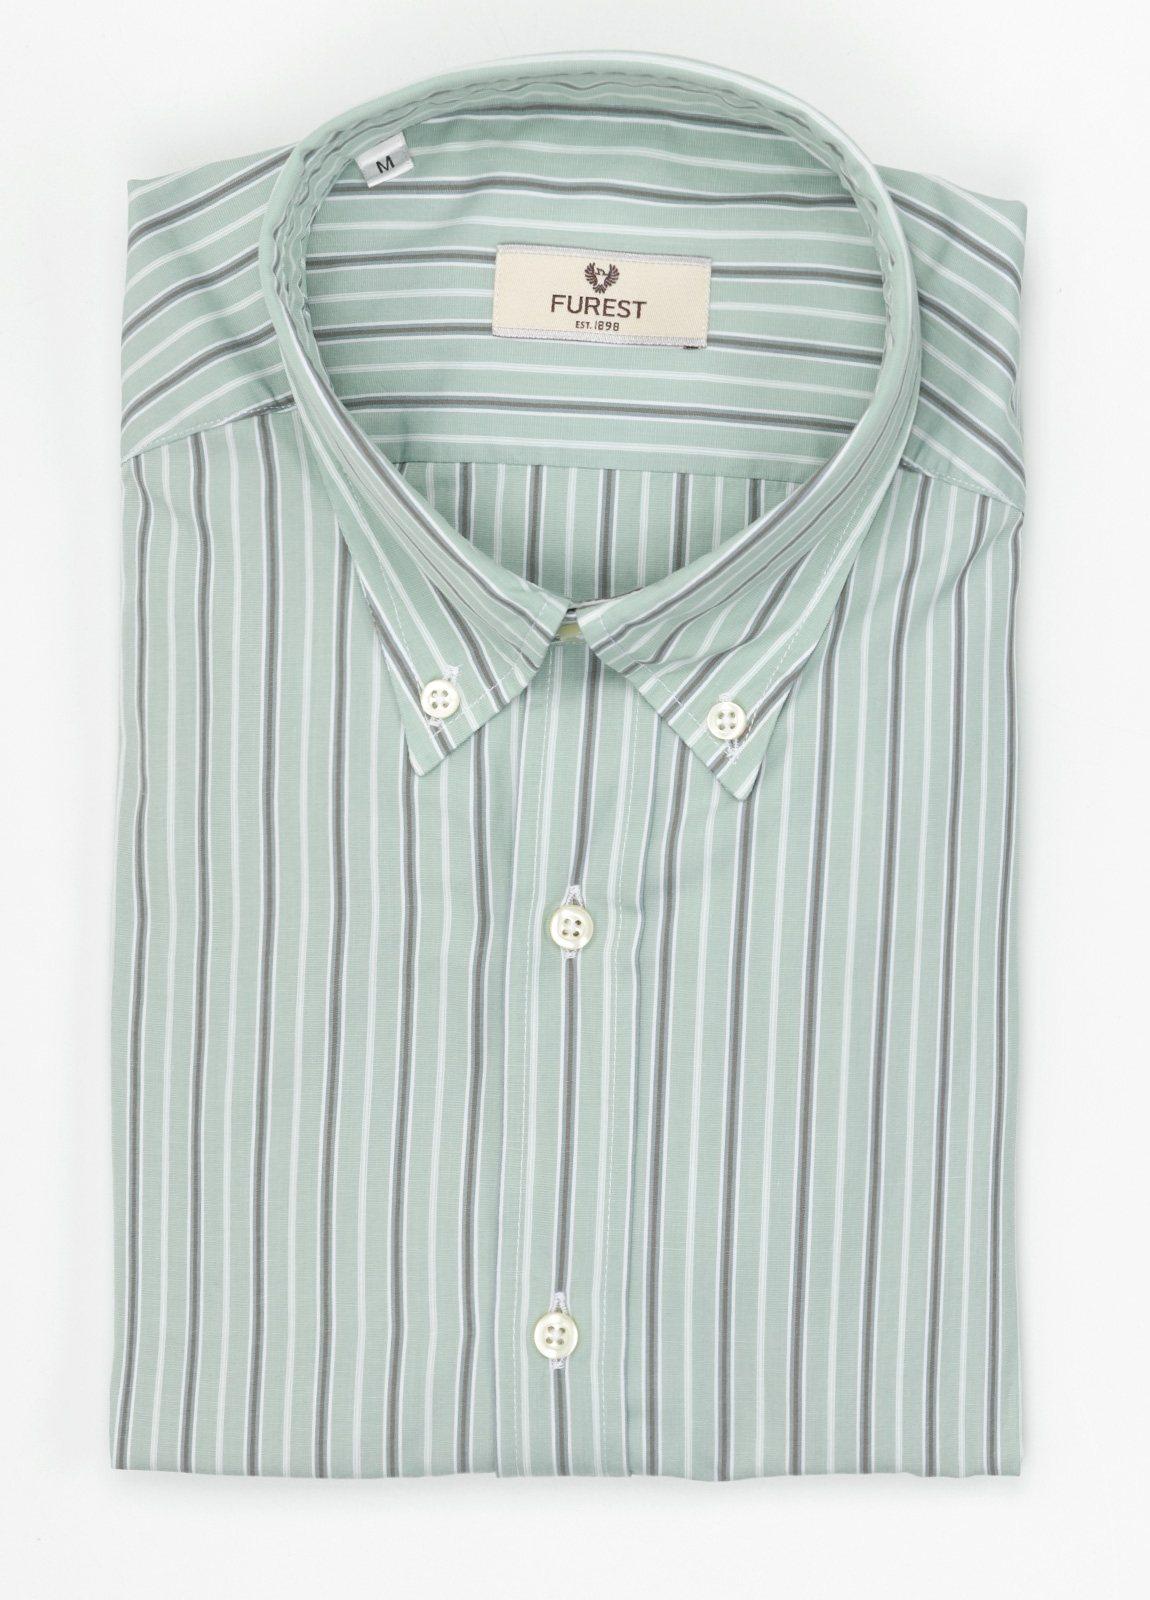 Camisa Leisure Wear SLIM FIT Modelo BOTTON DOWN color verde, estampado rayas gris. 100% Algodón. - Ítem4